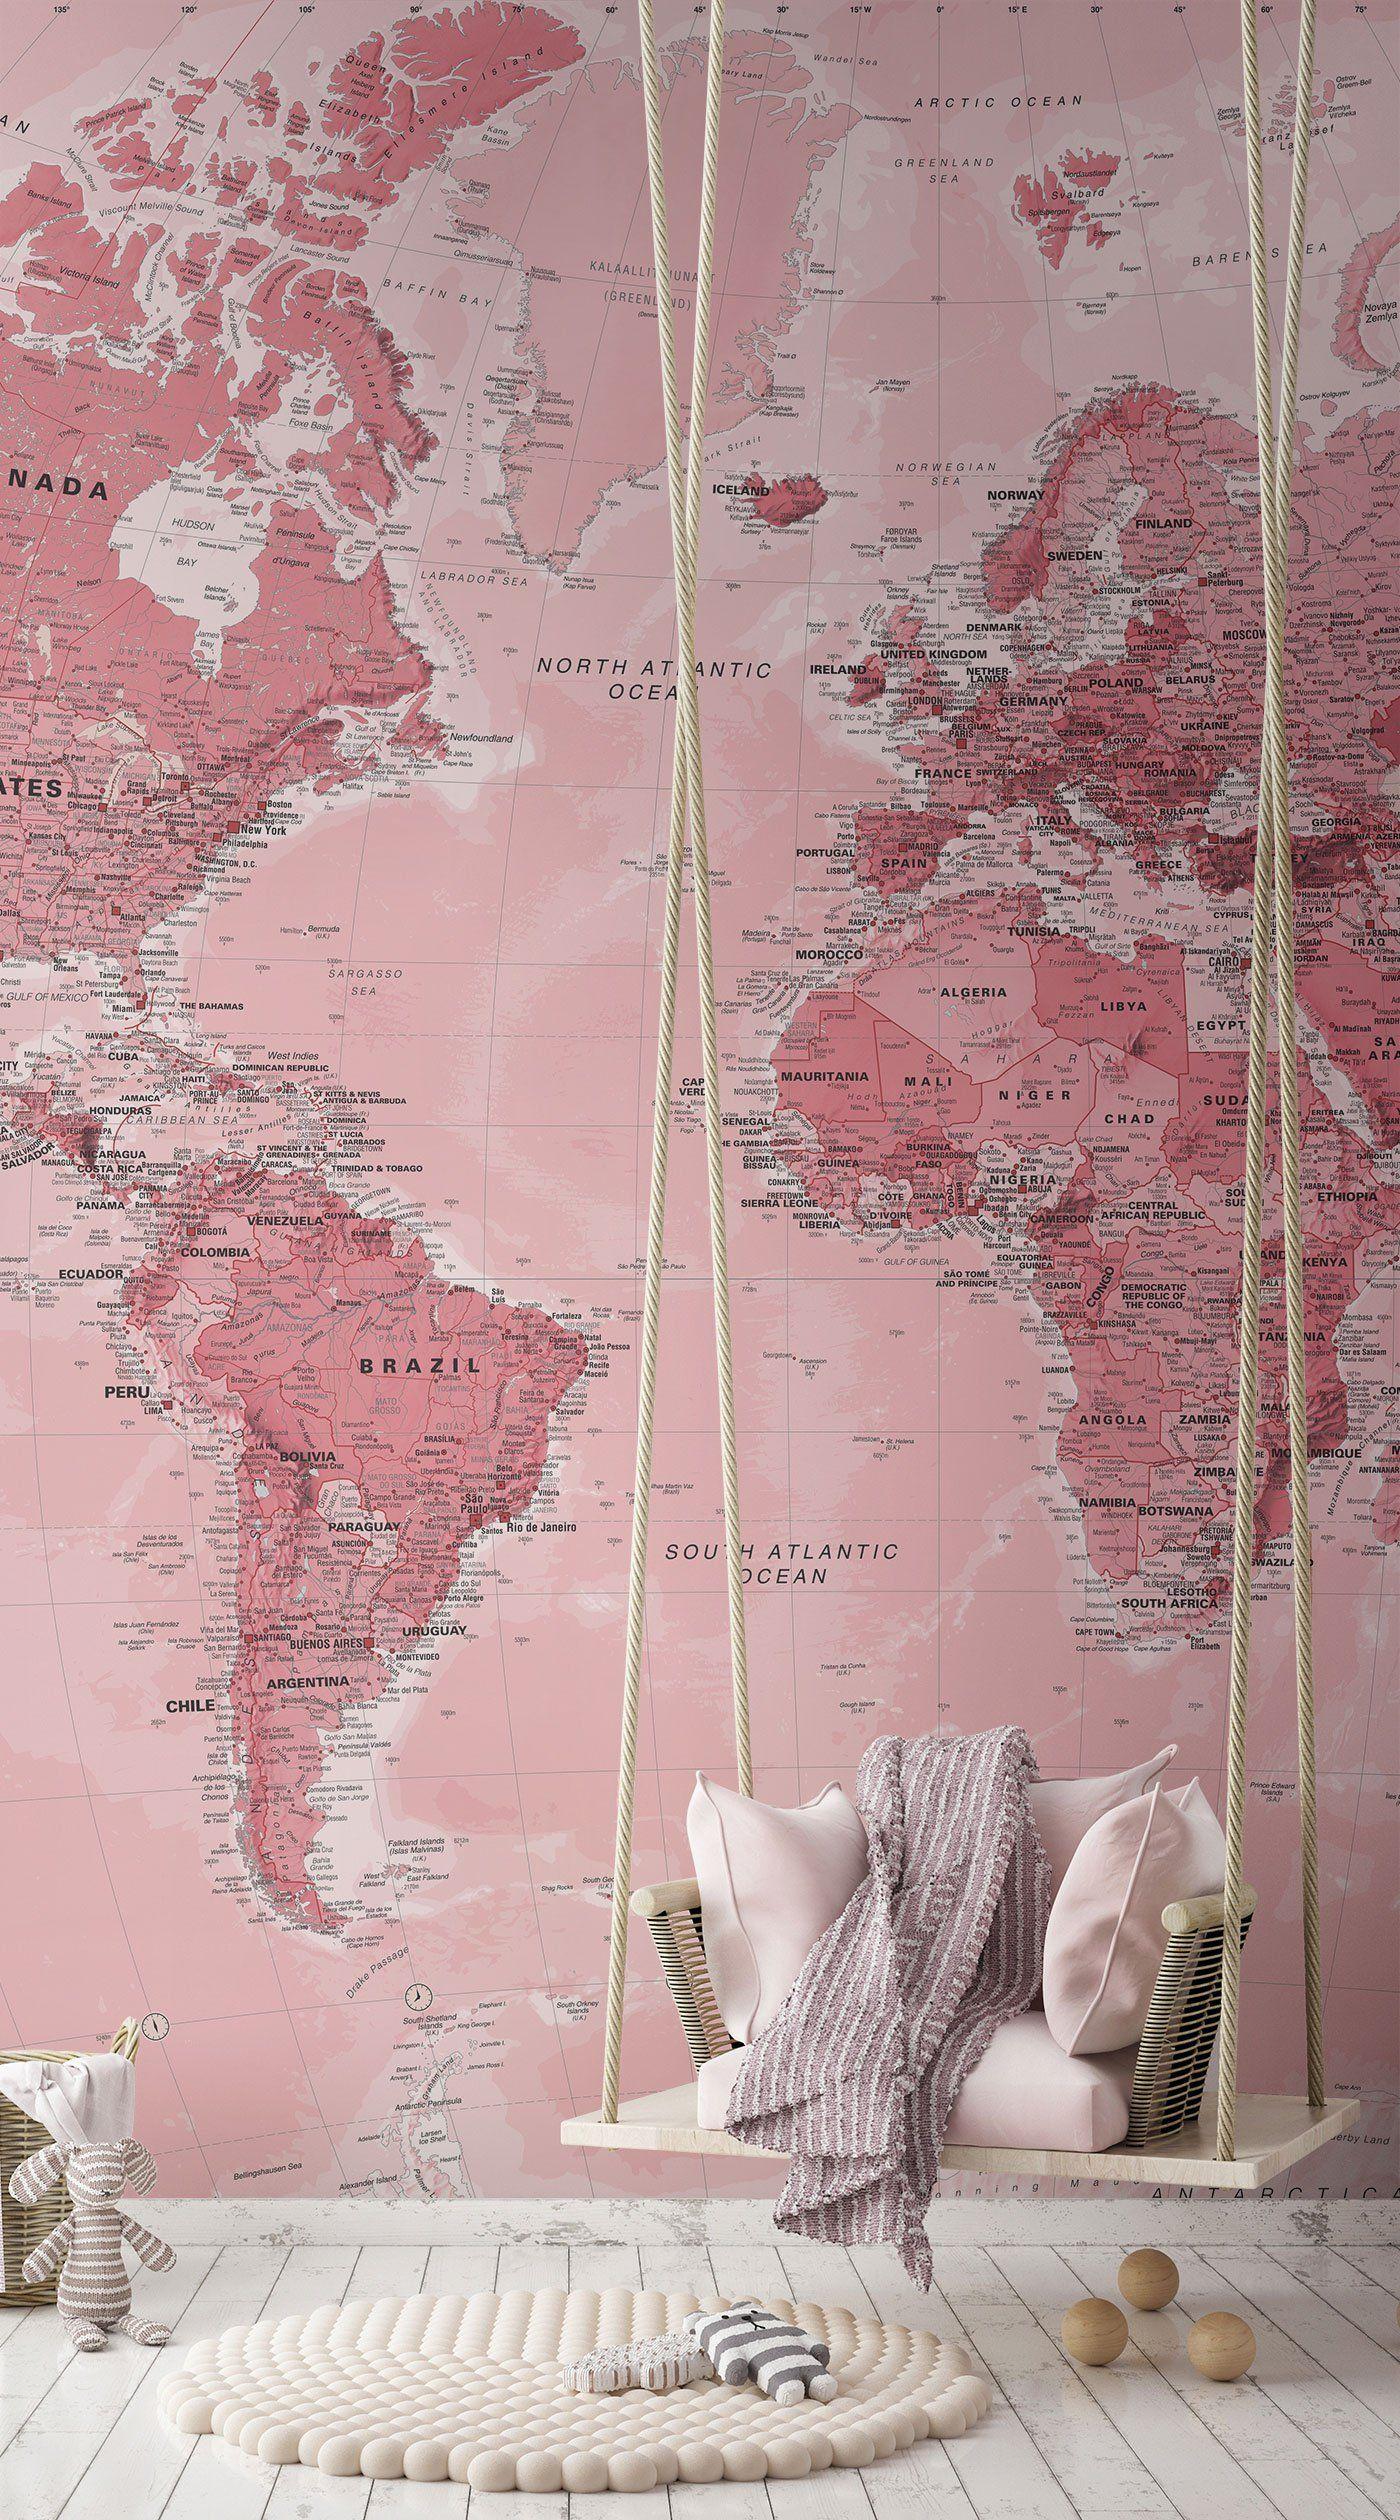 Superieur Millennial Pink: How To Achieve The Hot Pink Trend With Murals Wallpaper    Murals Wallpaper